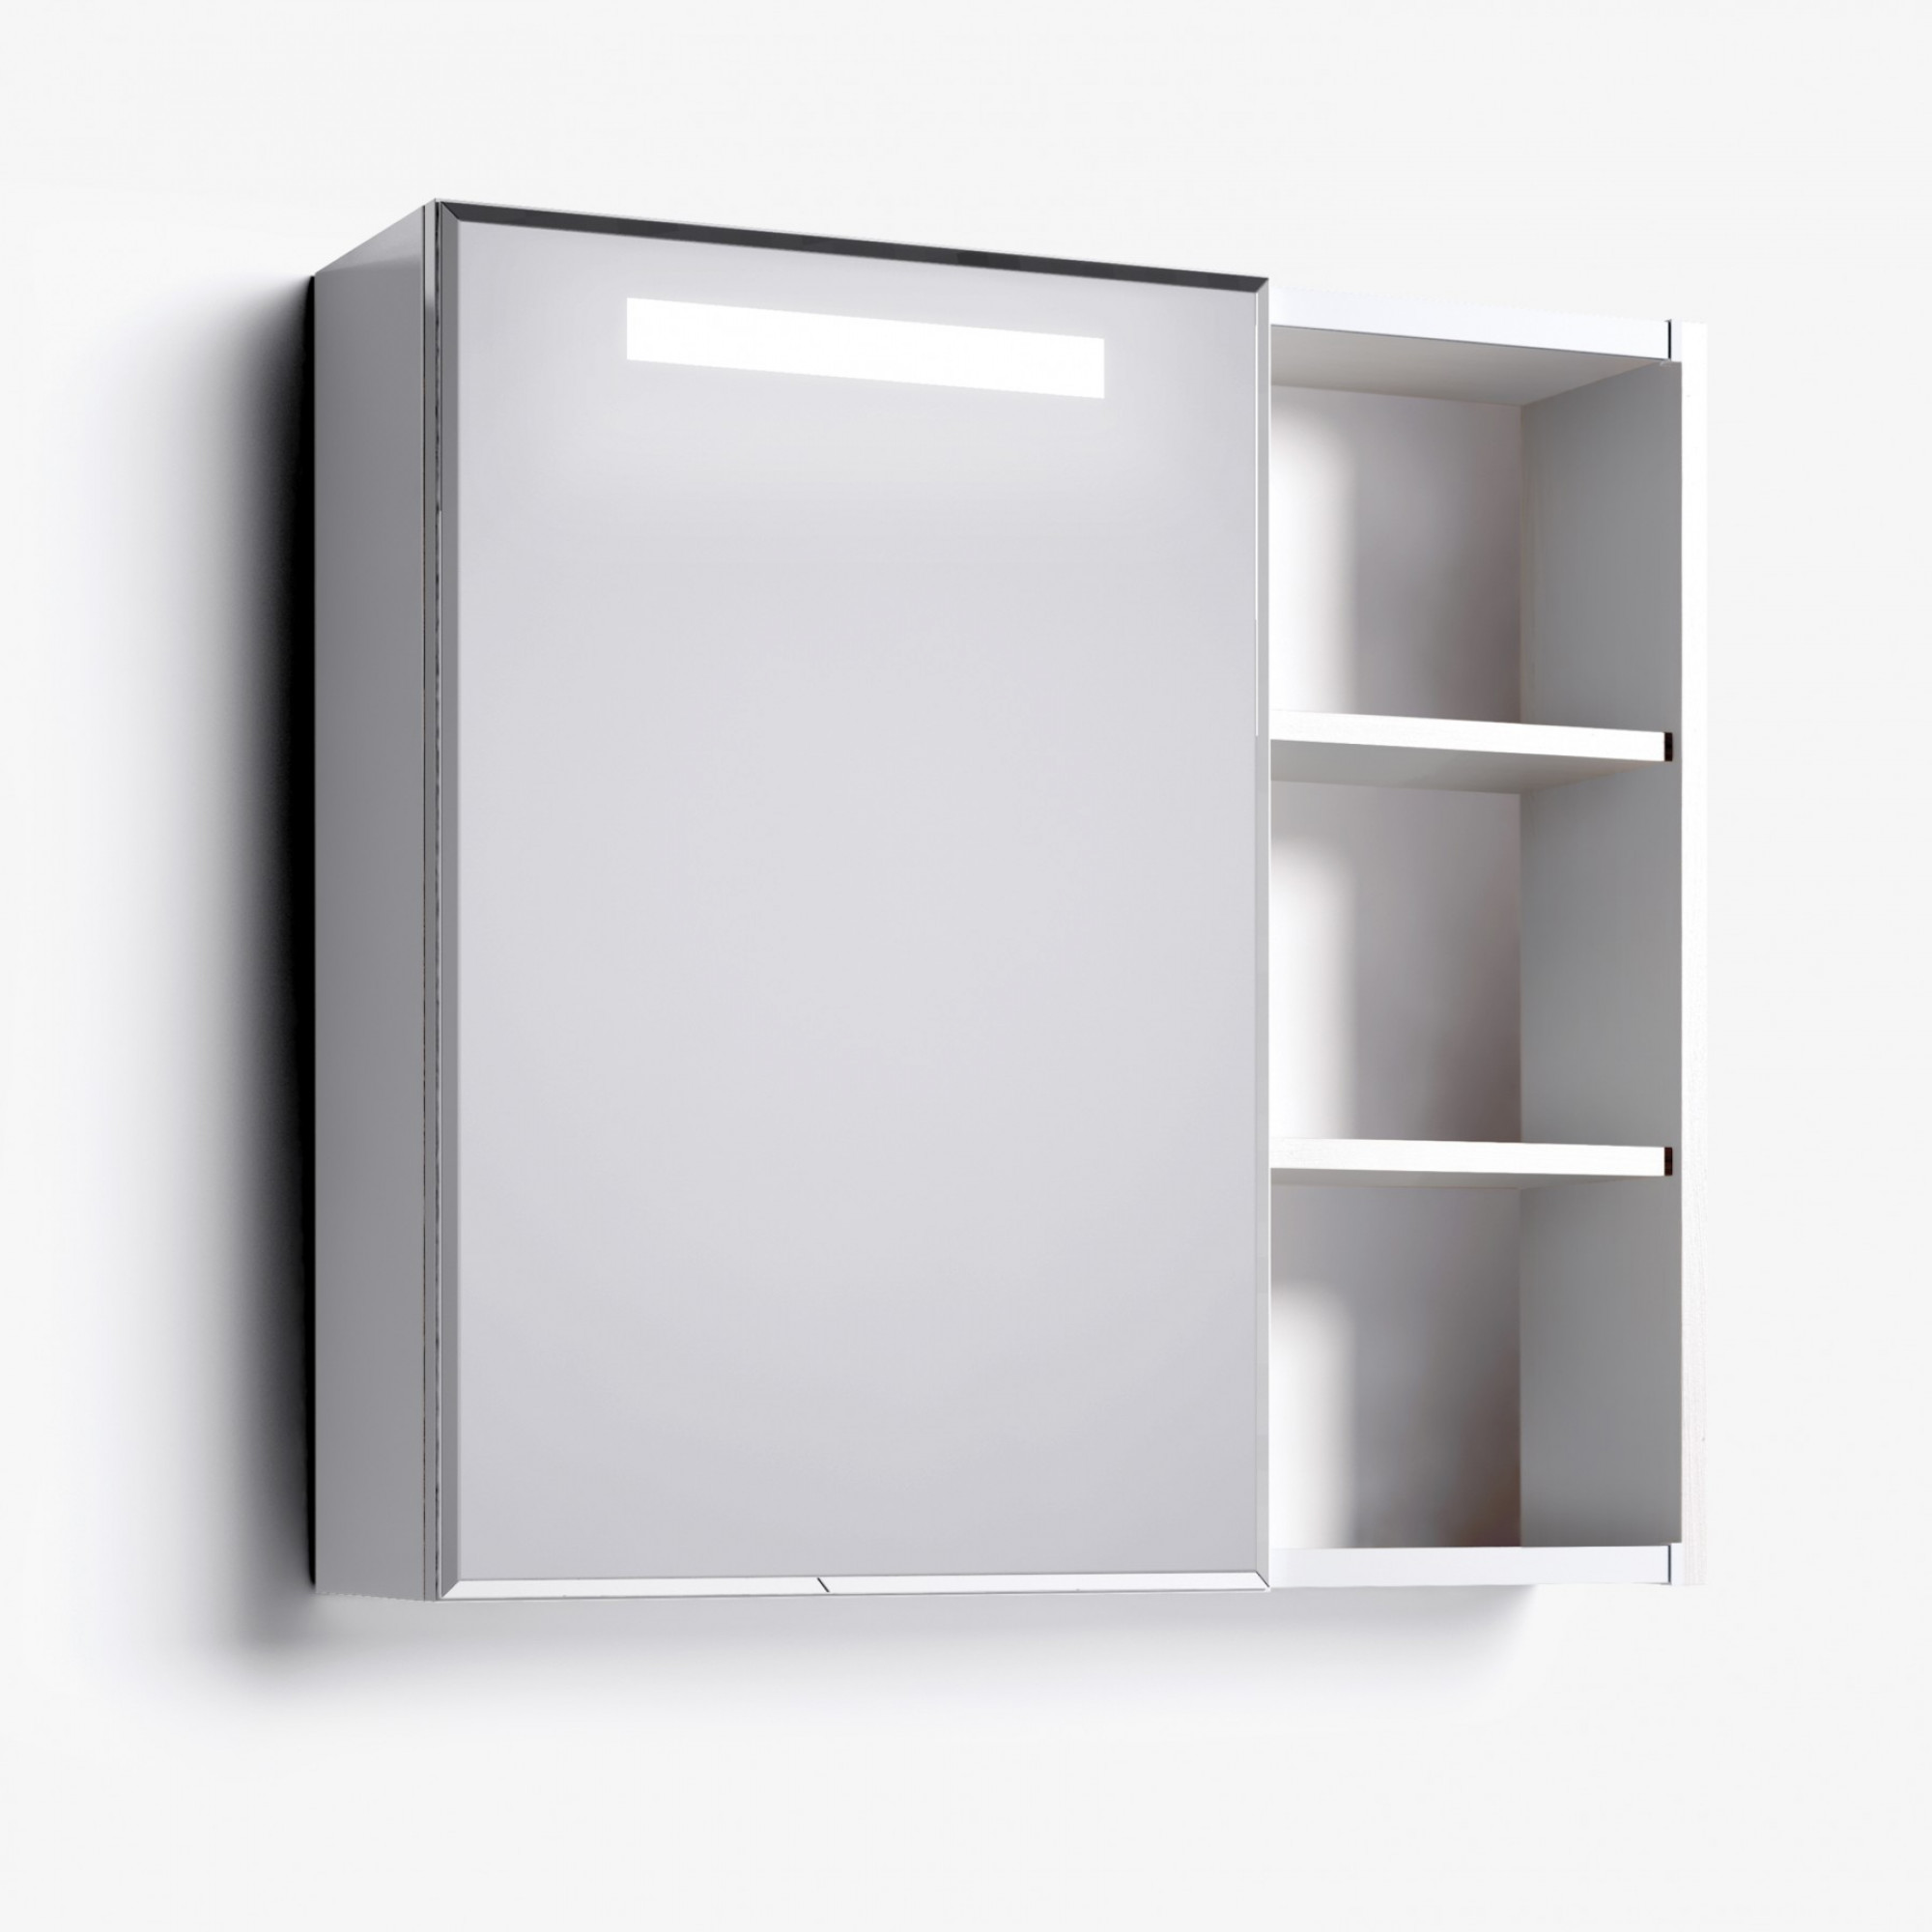 Шкаф зеркальный Marko 80 +9 950 руб.